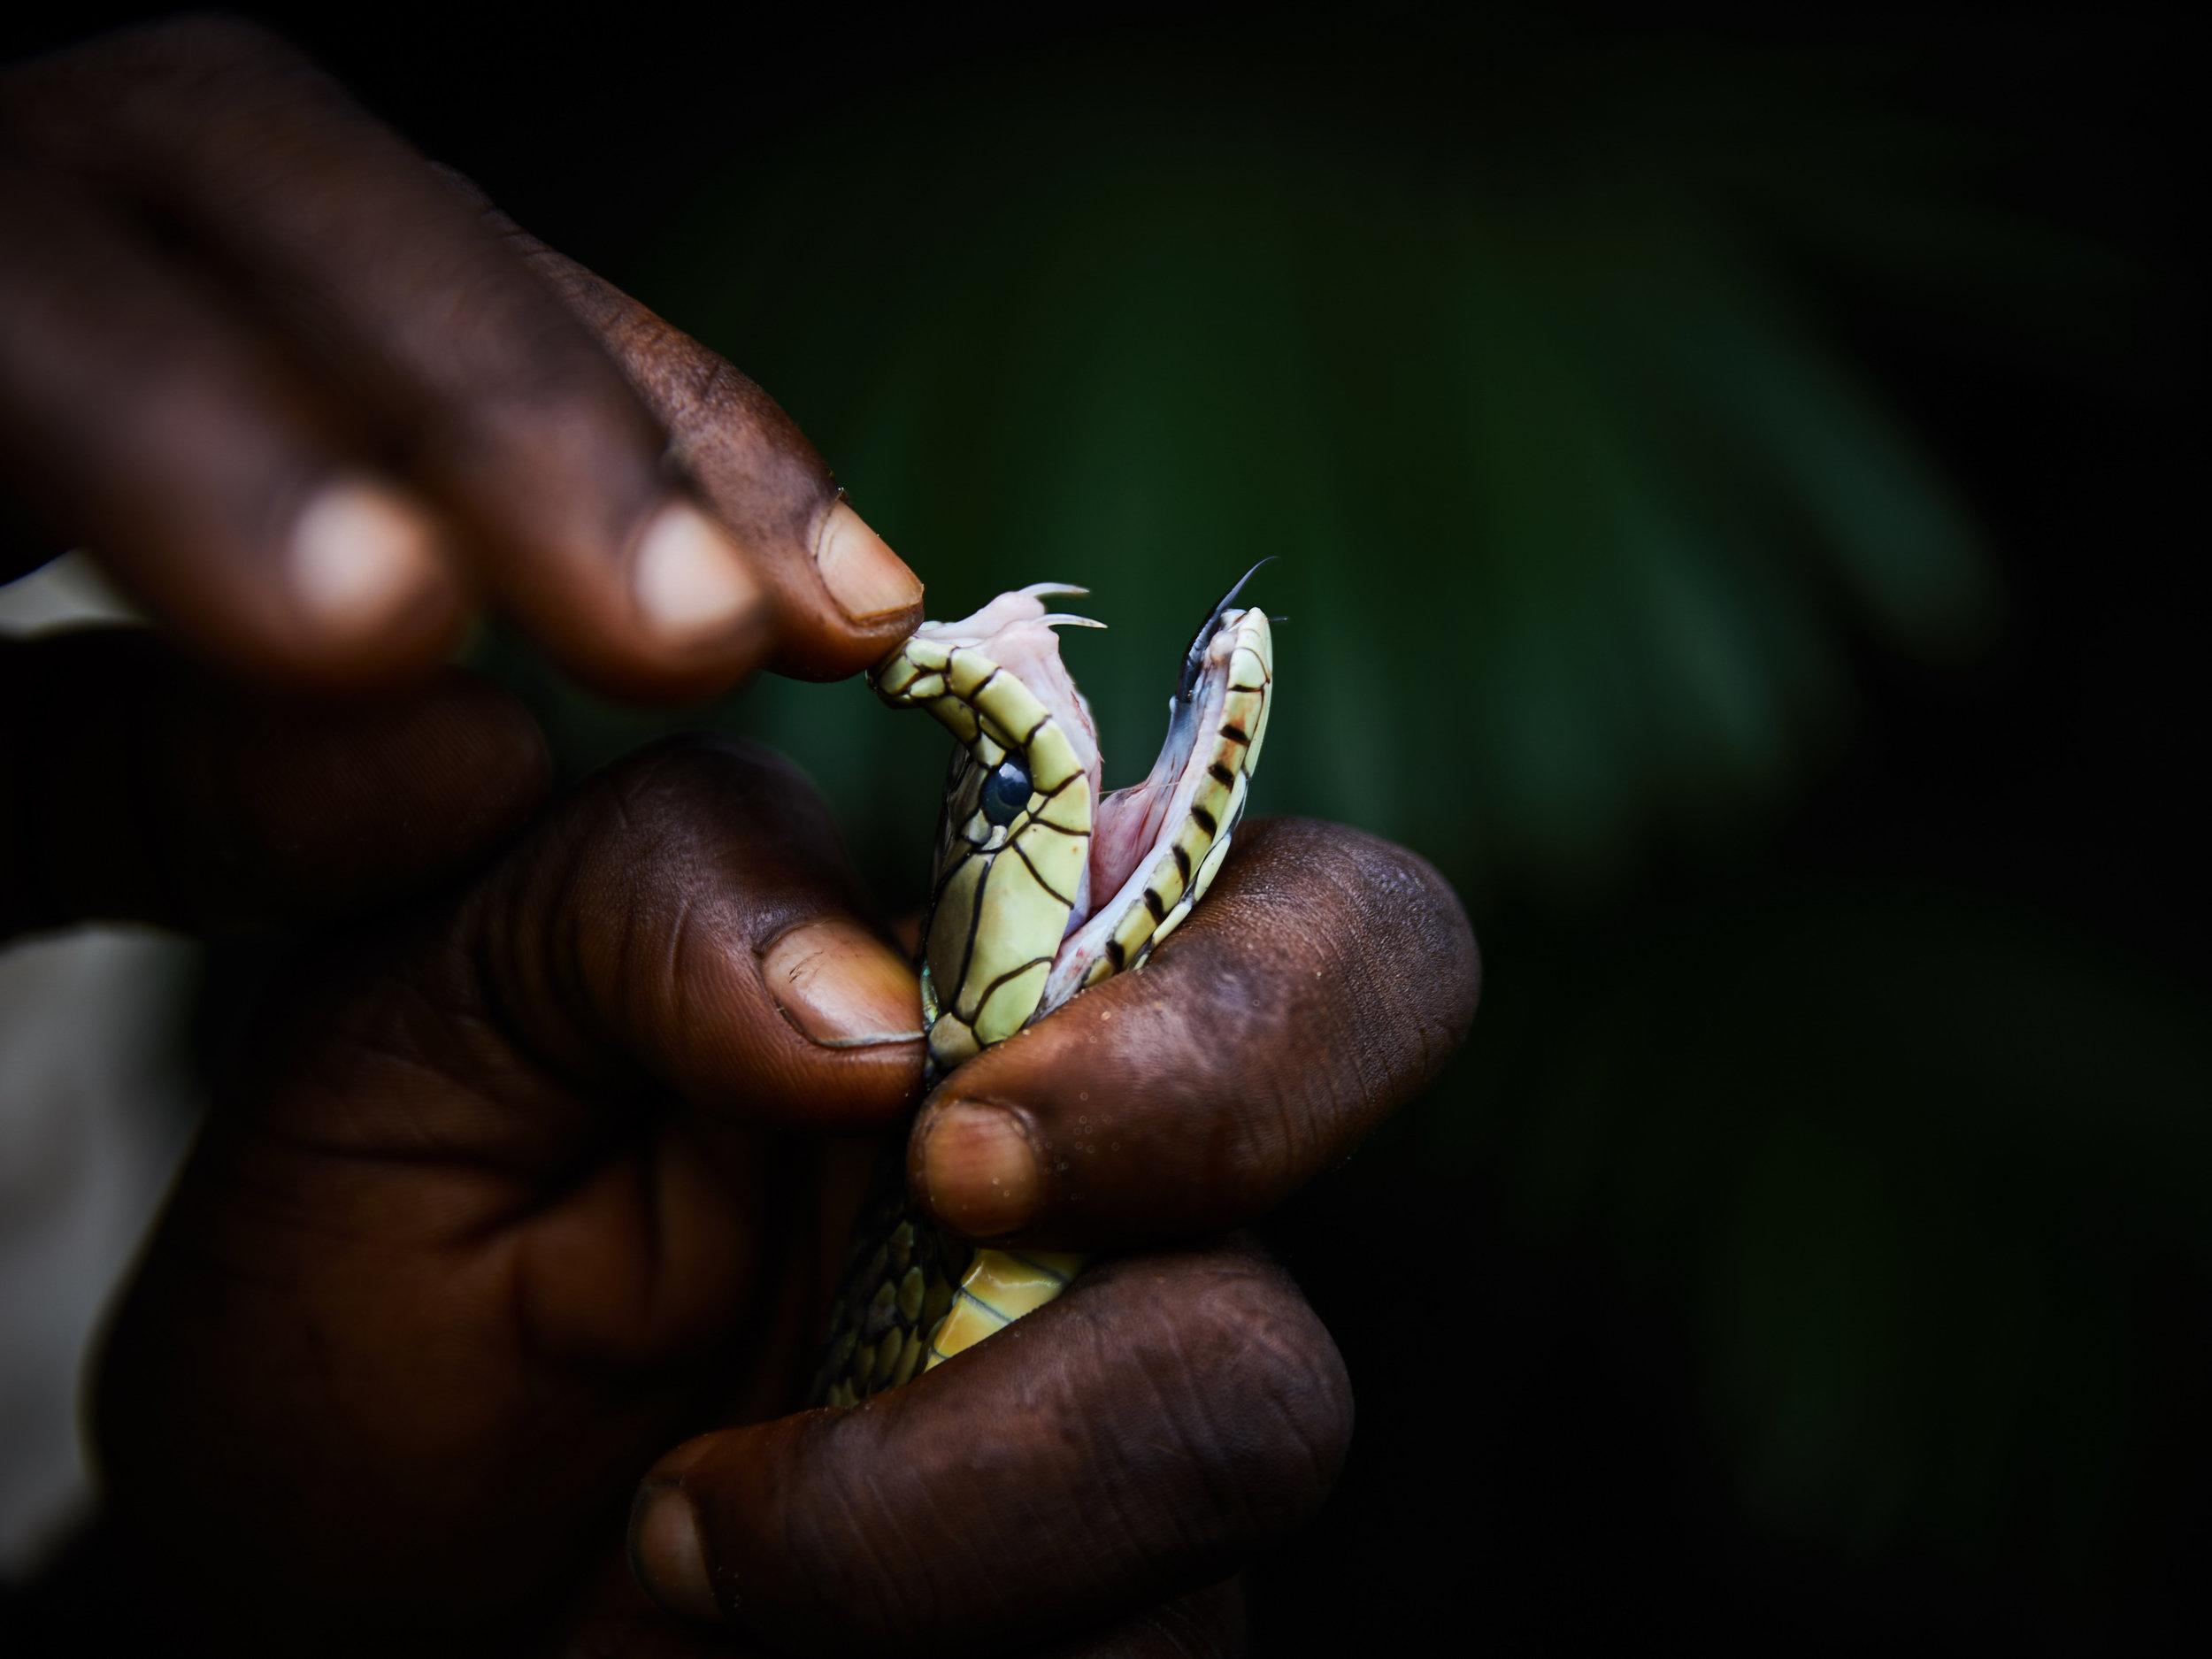 Snakebite Envenomation: A Global Health Crisis.